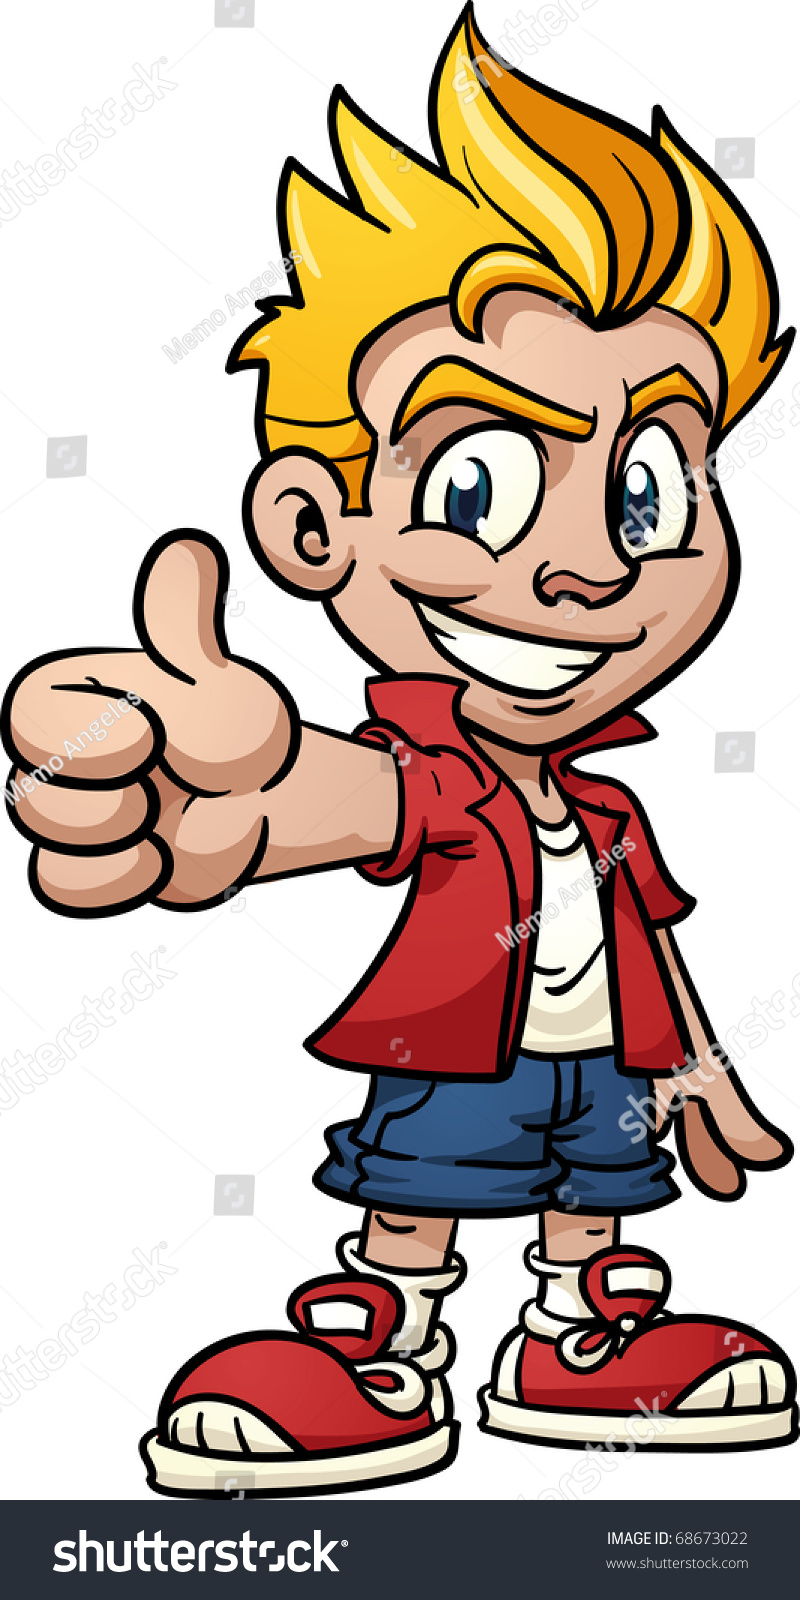 cool cartoon kid making thumbs up hand gesture vector illustration with simple gradients - Cartoon Kid Images